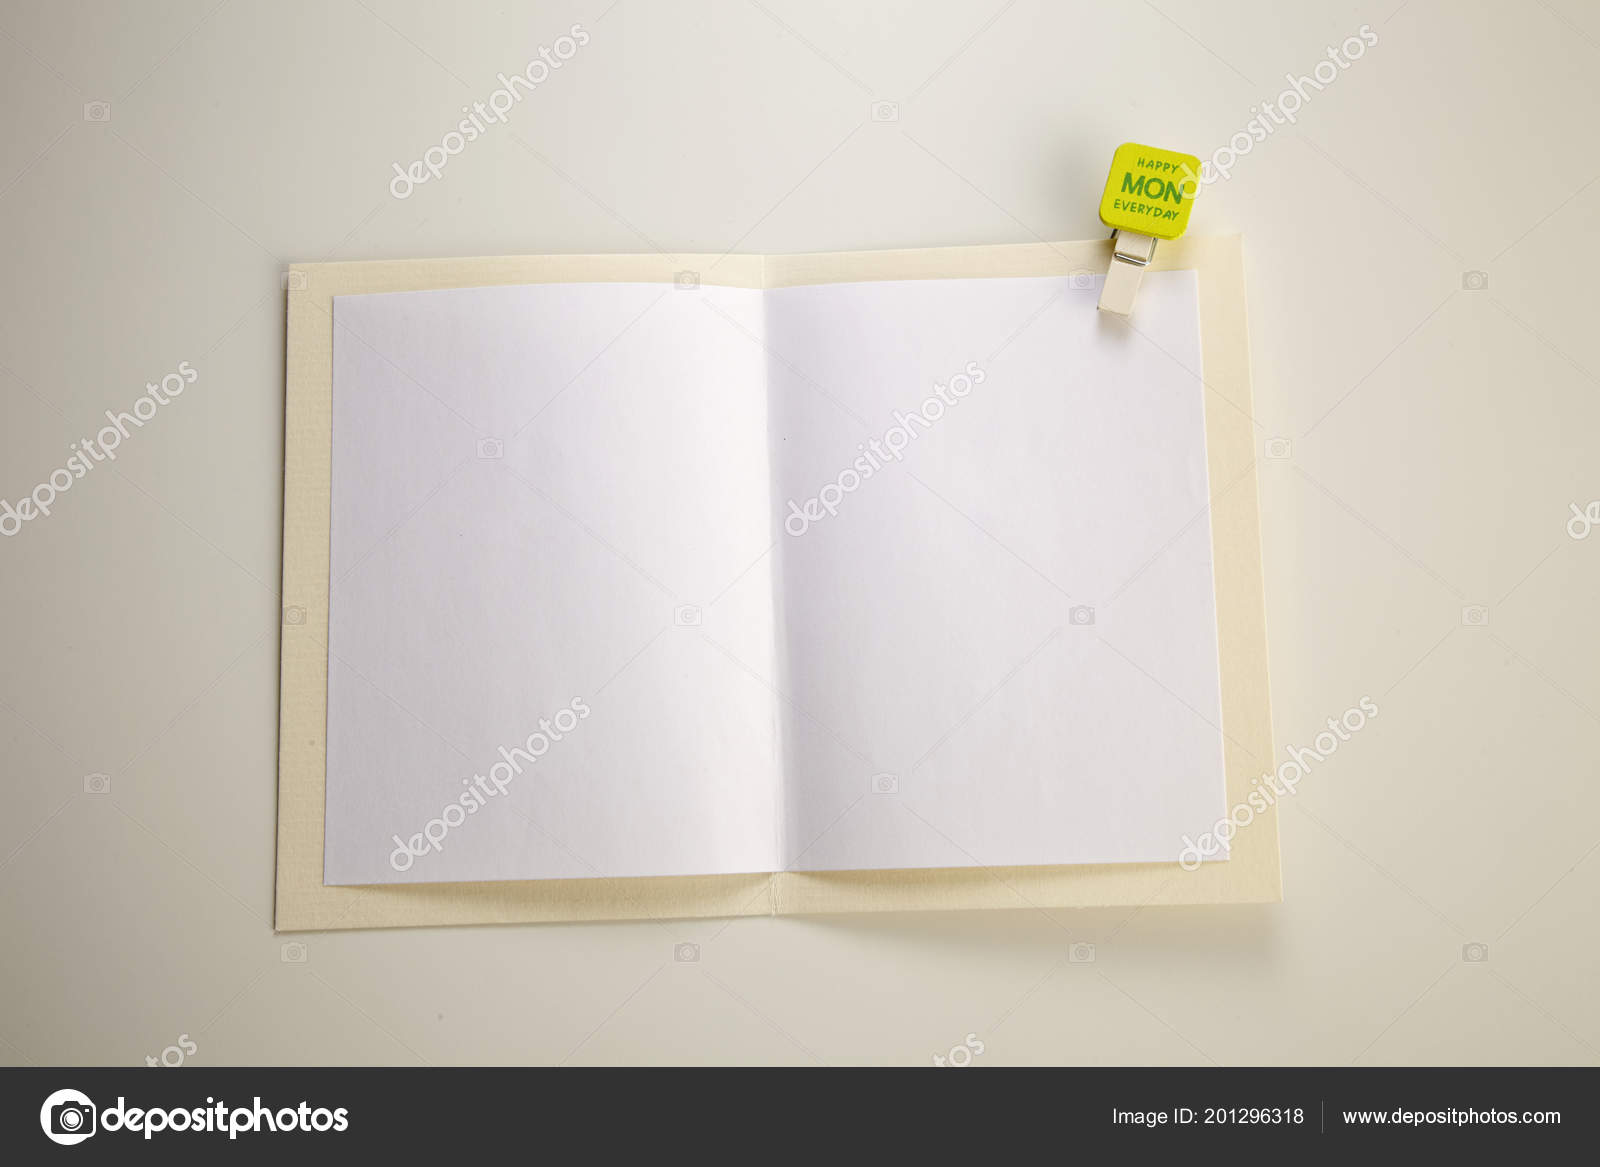 Blank greeting card happy monday stock photo eskaylim 201296318 blank greeting card happy monday stock photo m4hsunfo